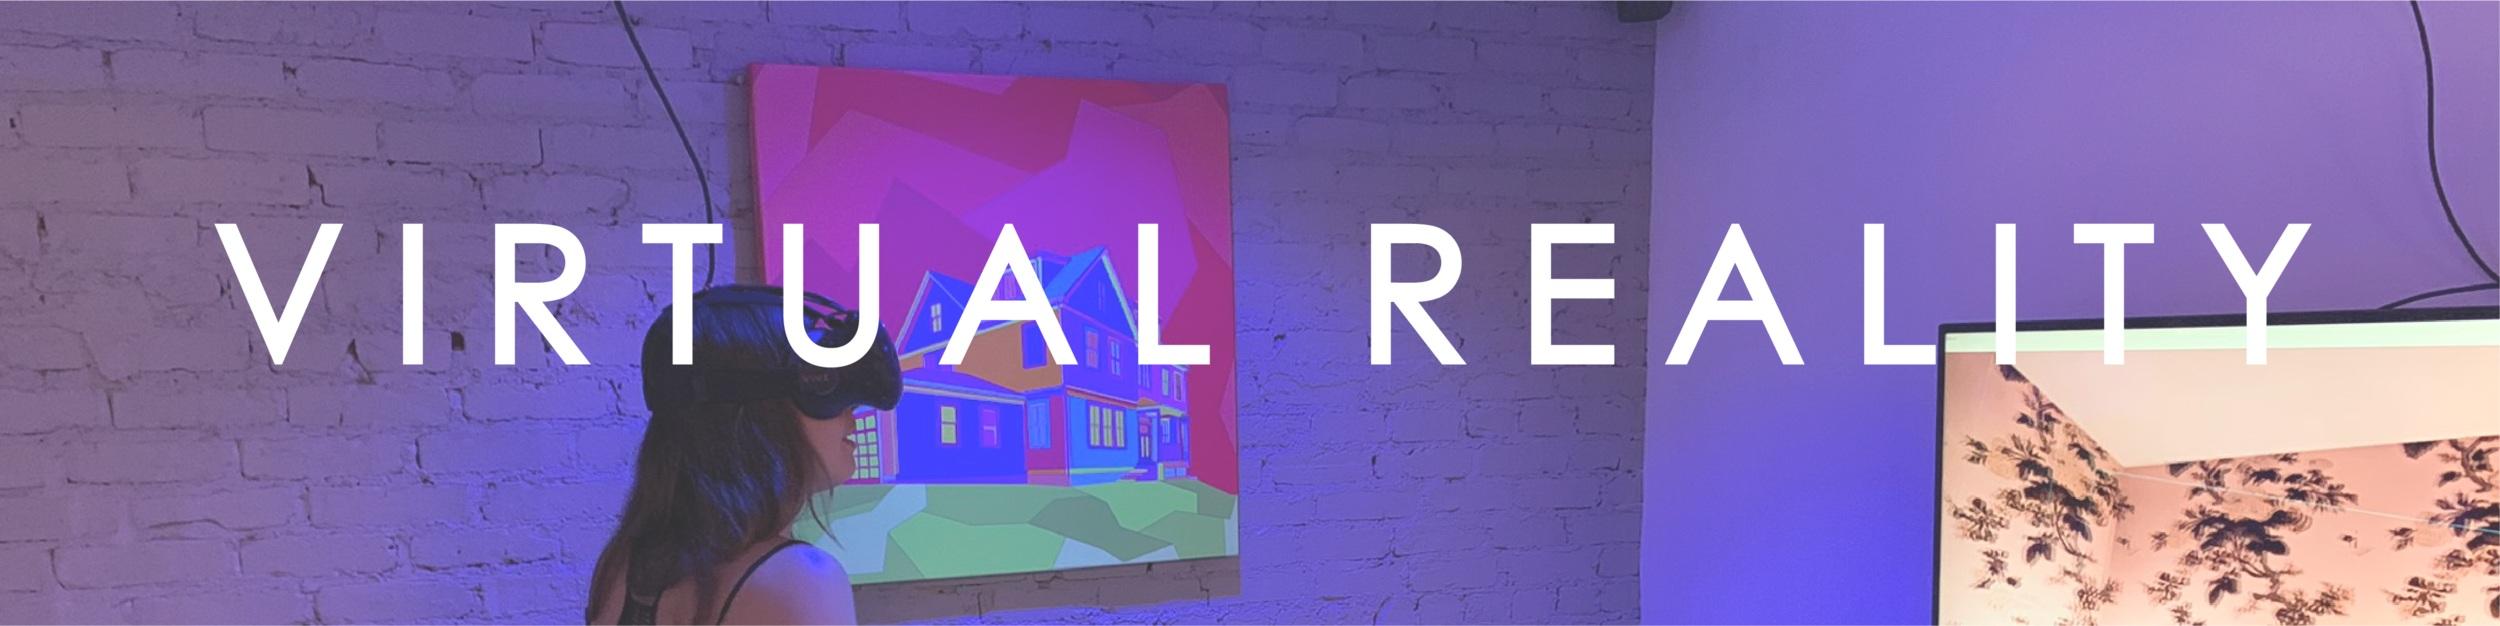 title_virtual reality-13.png